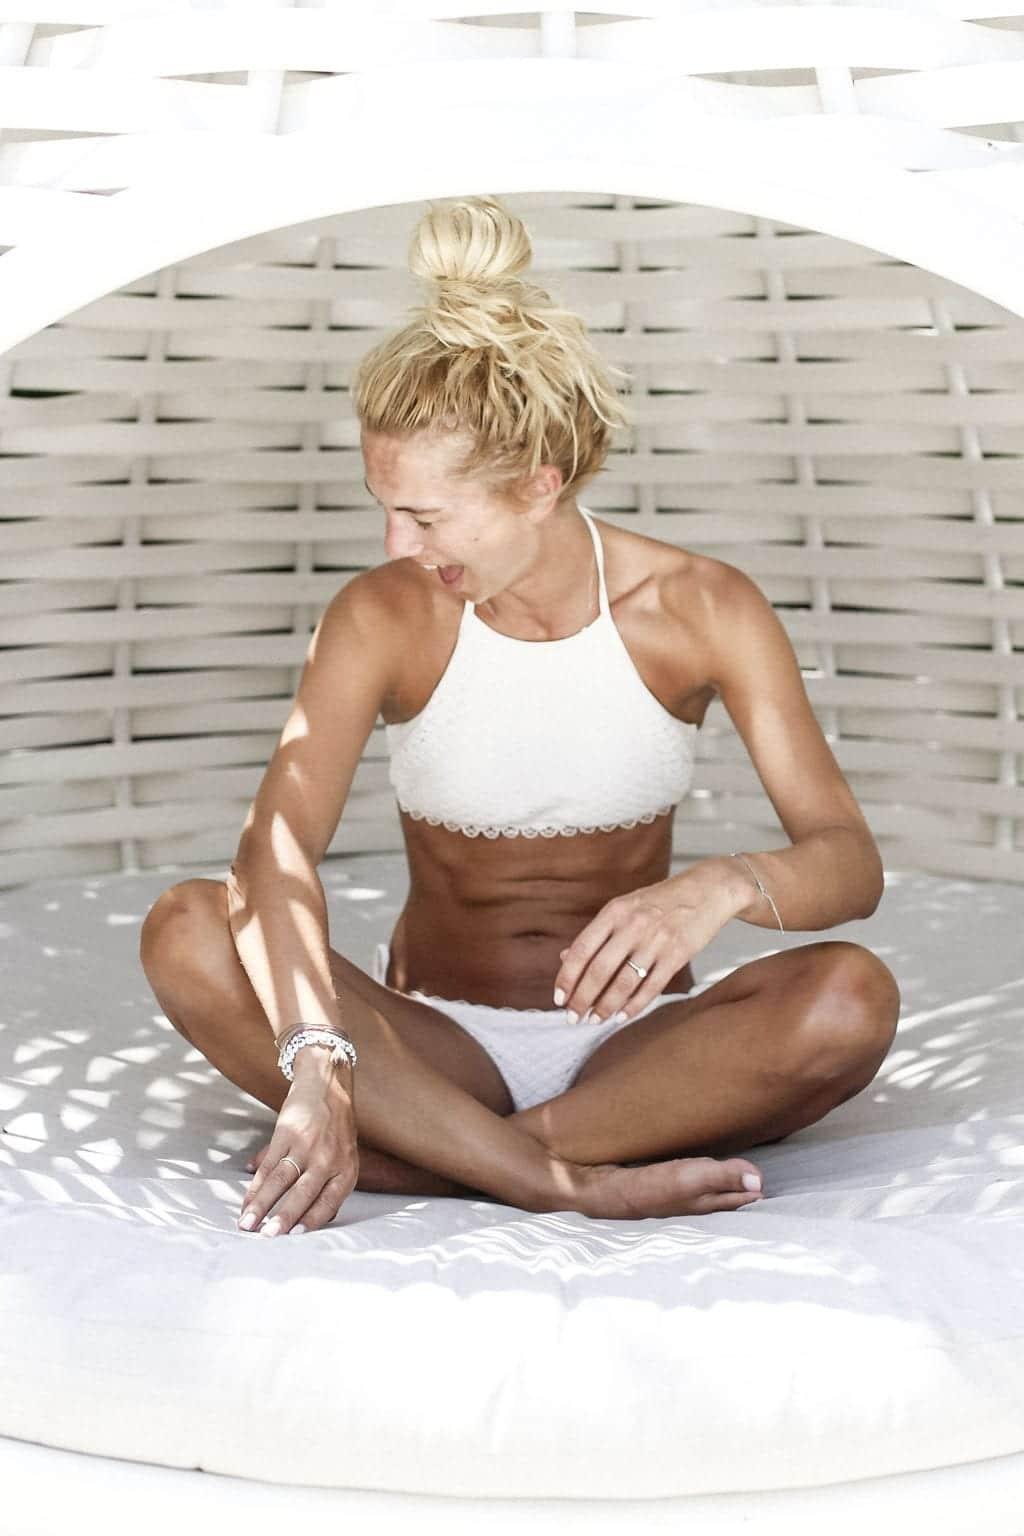 CK-1606_Sardinien-Sardegna-Sardinia-Italy-Italia-Fashion-Blog-Beach-Caribbean-Dress-Blonde-Karin-Kaswurm-Bikini-Kiini-0666